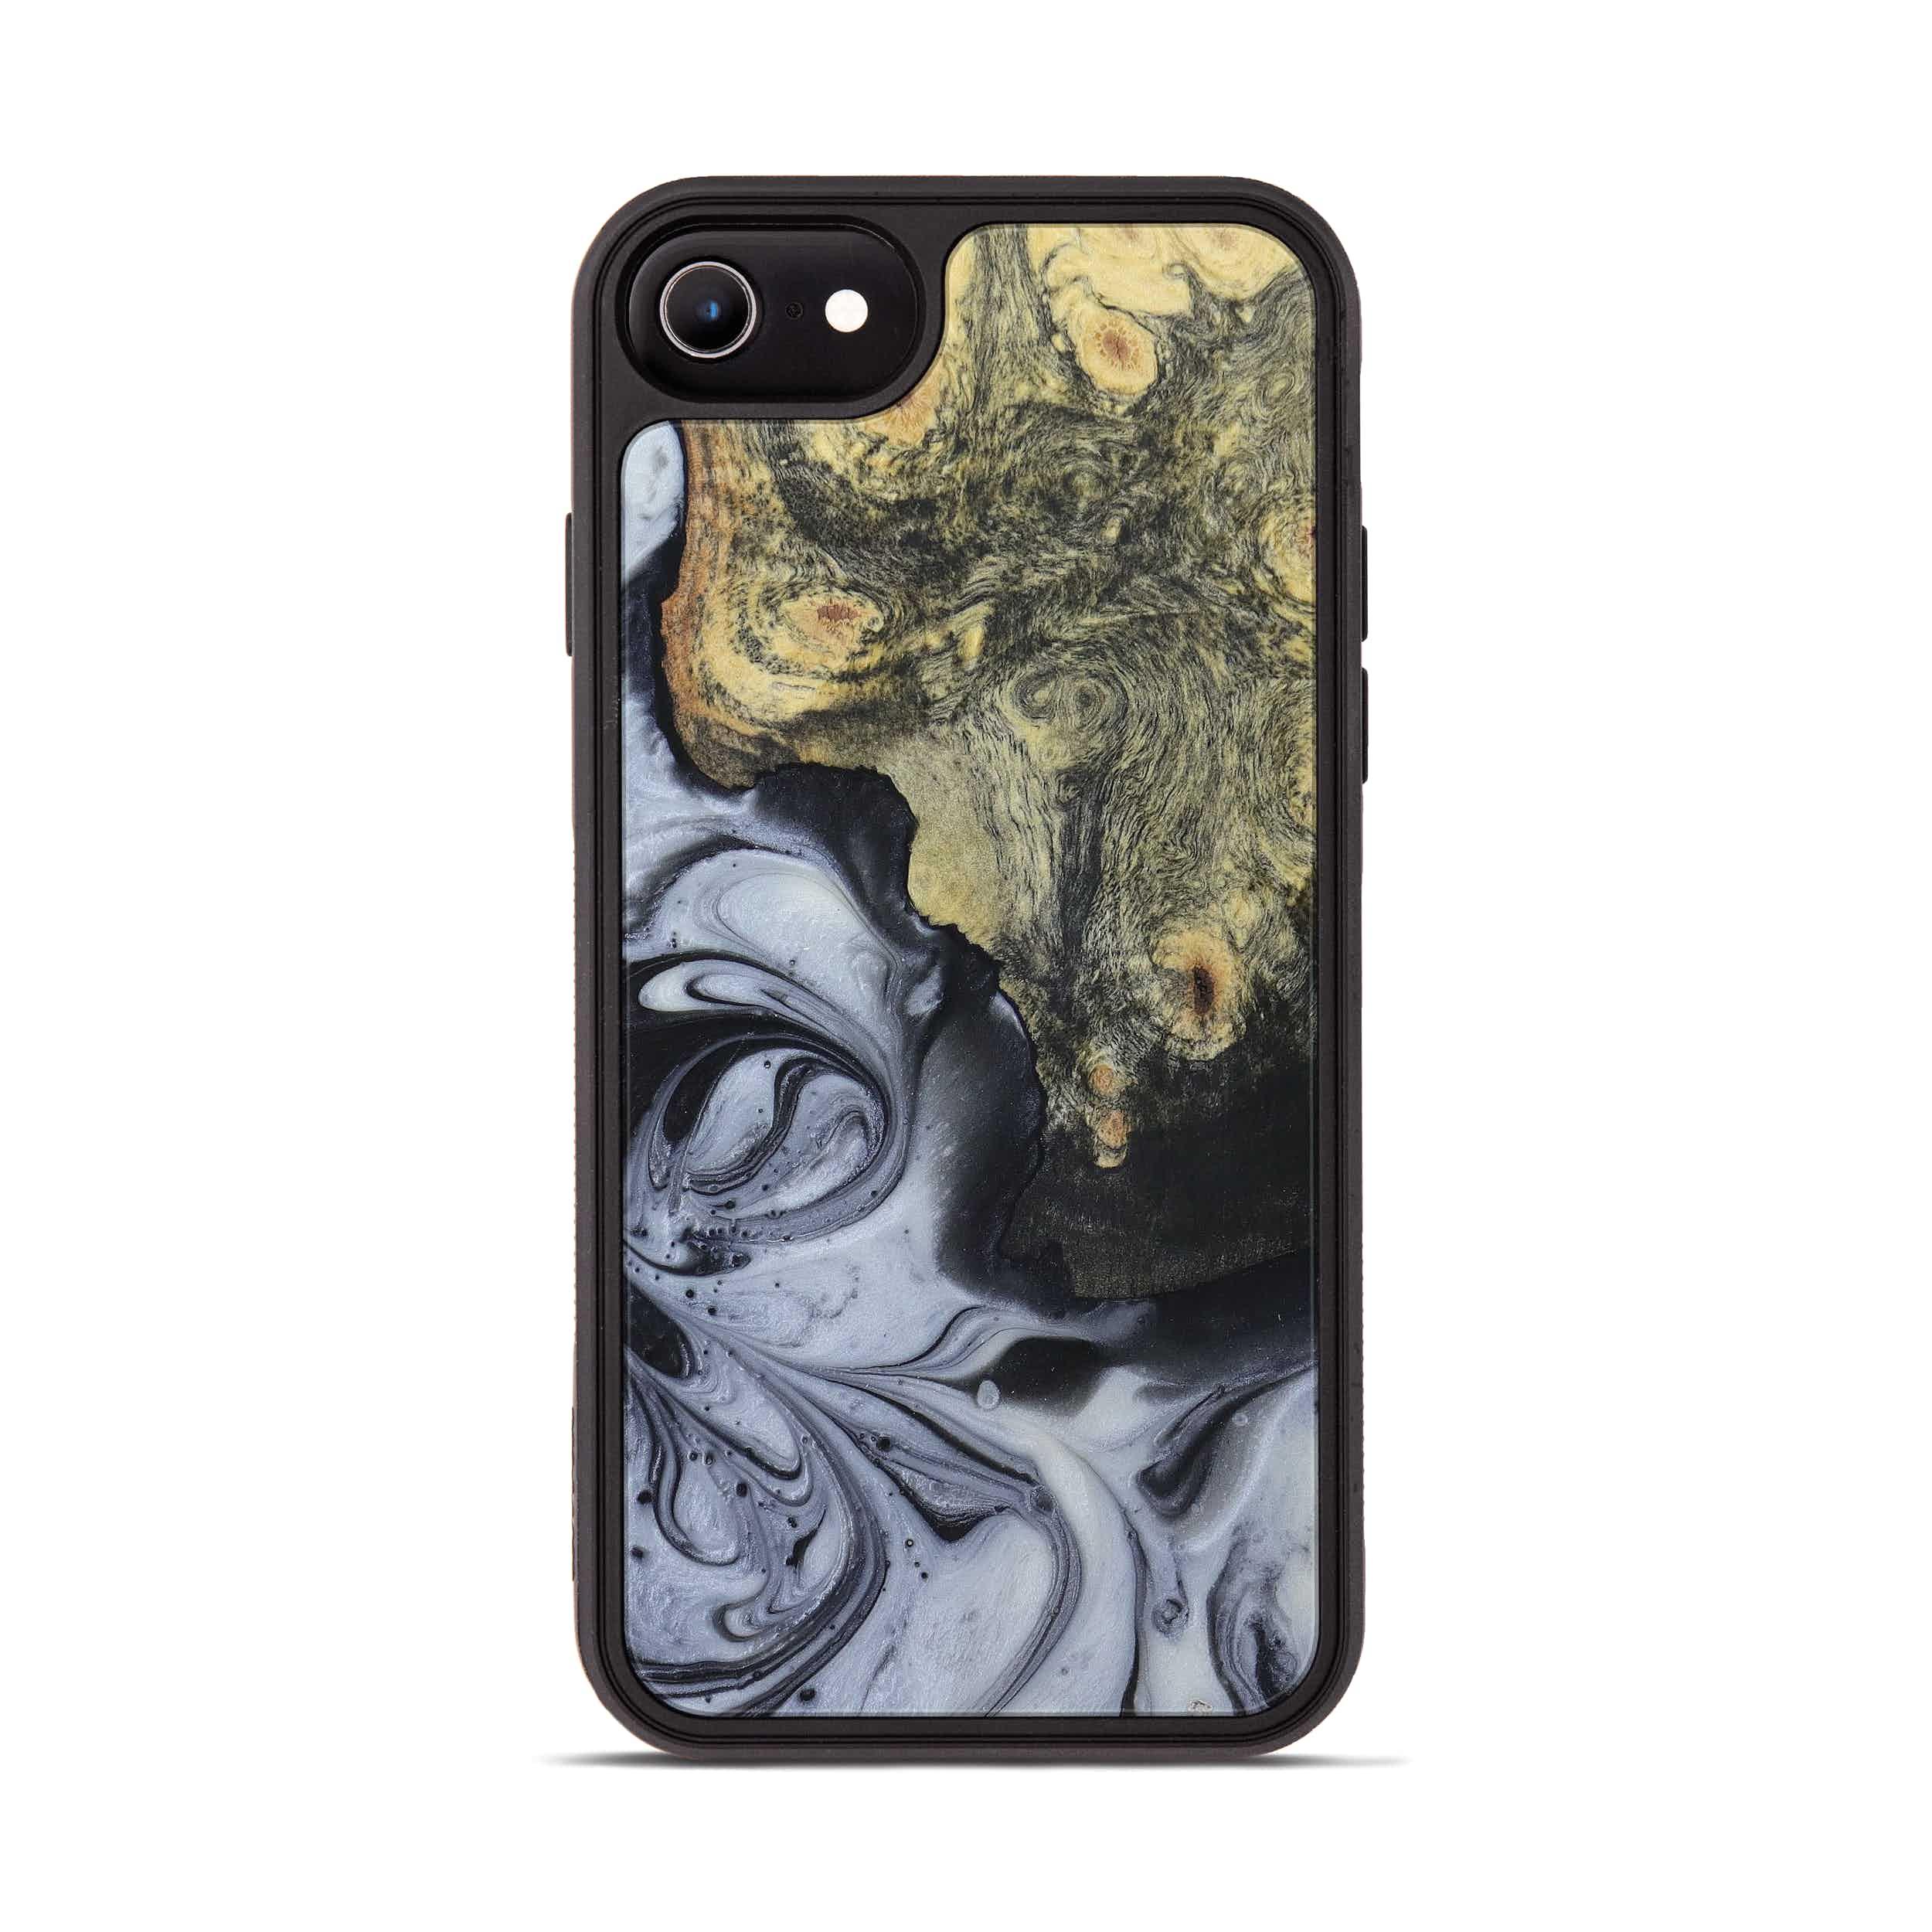 iPhone 6s Wood+Resin Phone Case - Rhonda (Black & White, 397914)